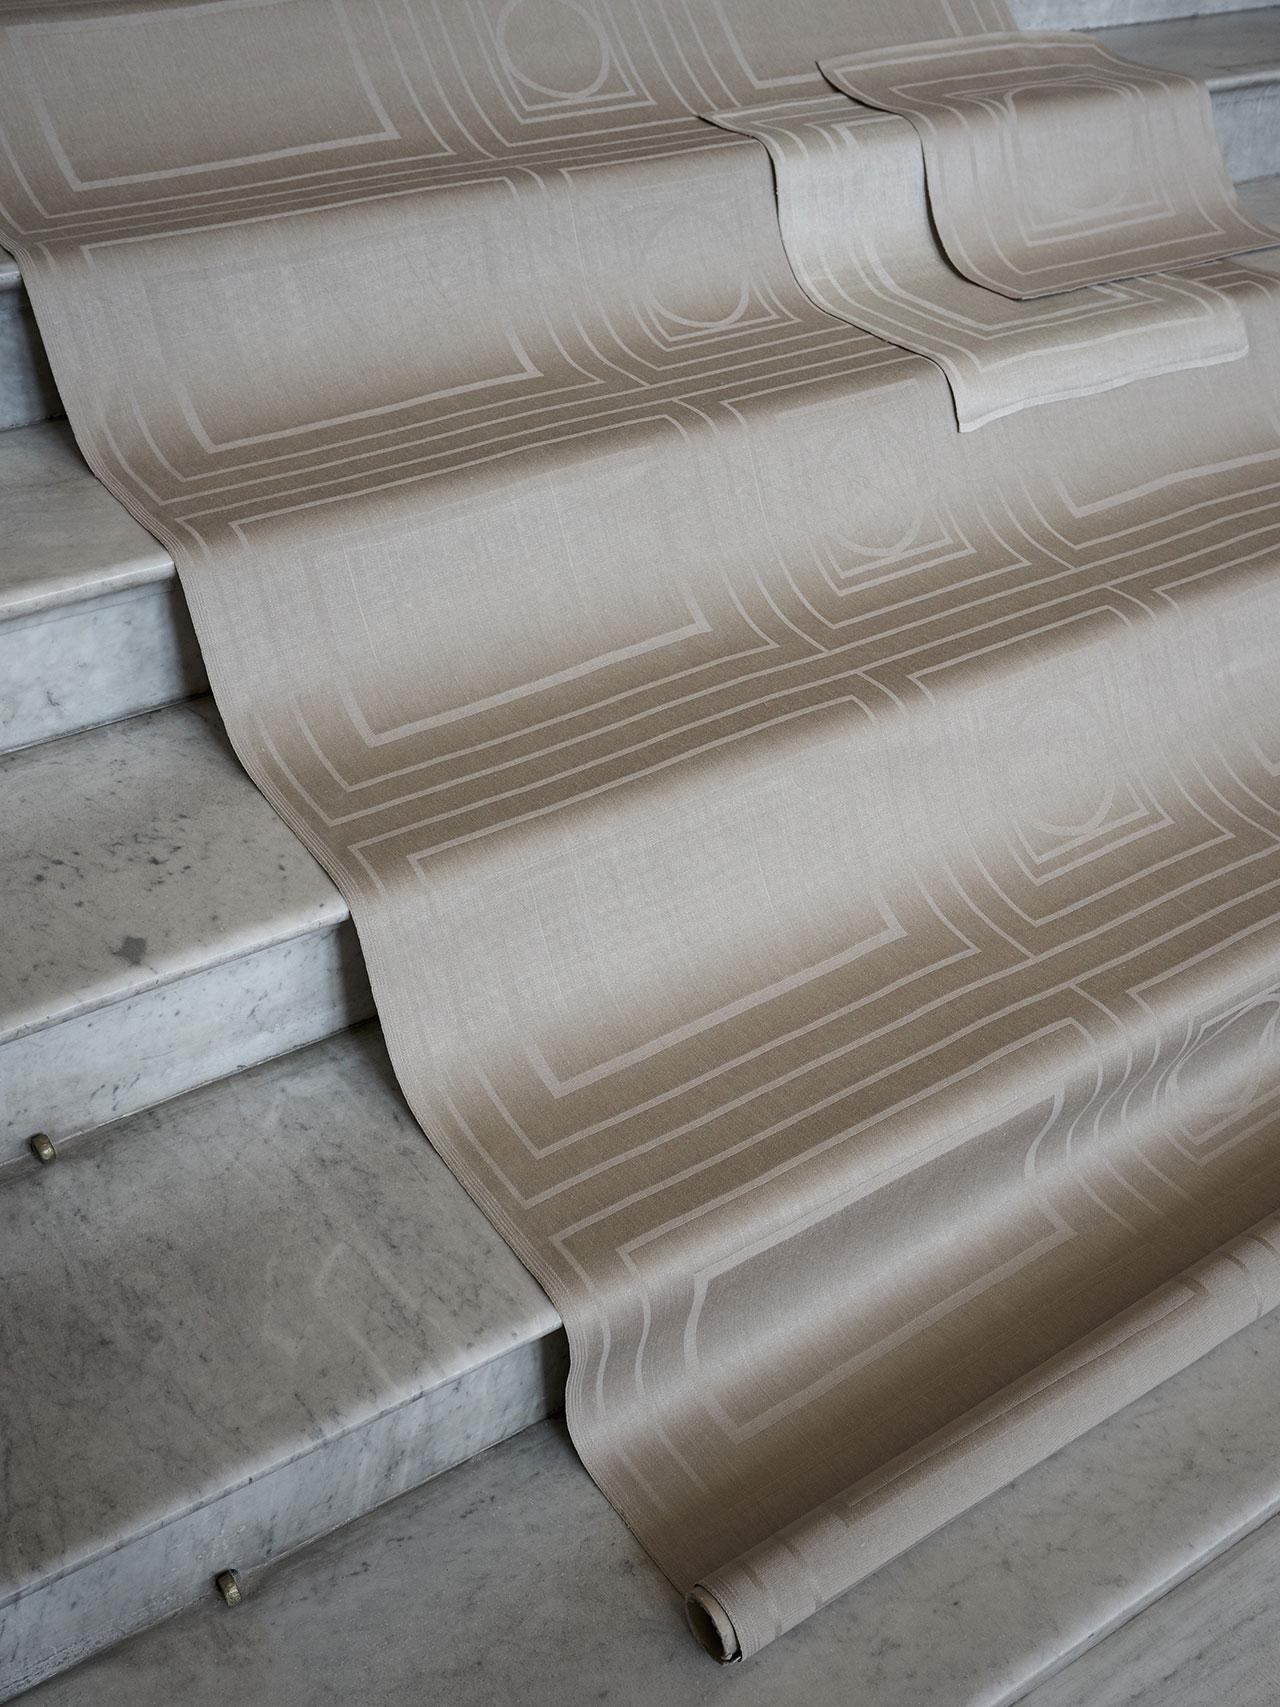 "NM& 065, NM& 066: ""Husets Linne"" linnen table cloths and napkins by Jakob Solgrenproduced by Klässbols Linneväveri. Photo by Pia Ulin."